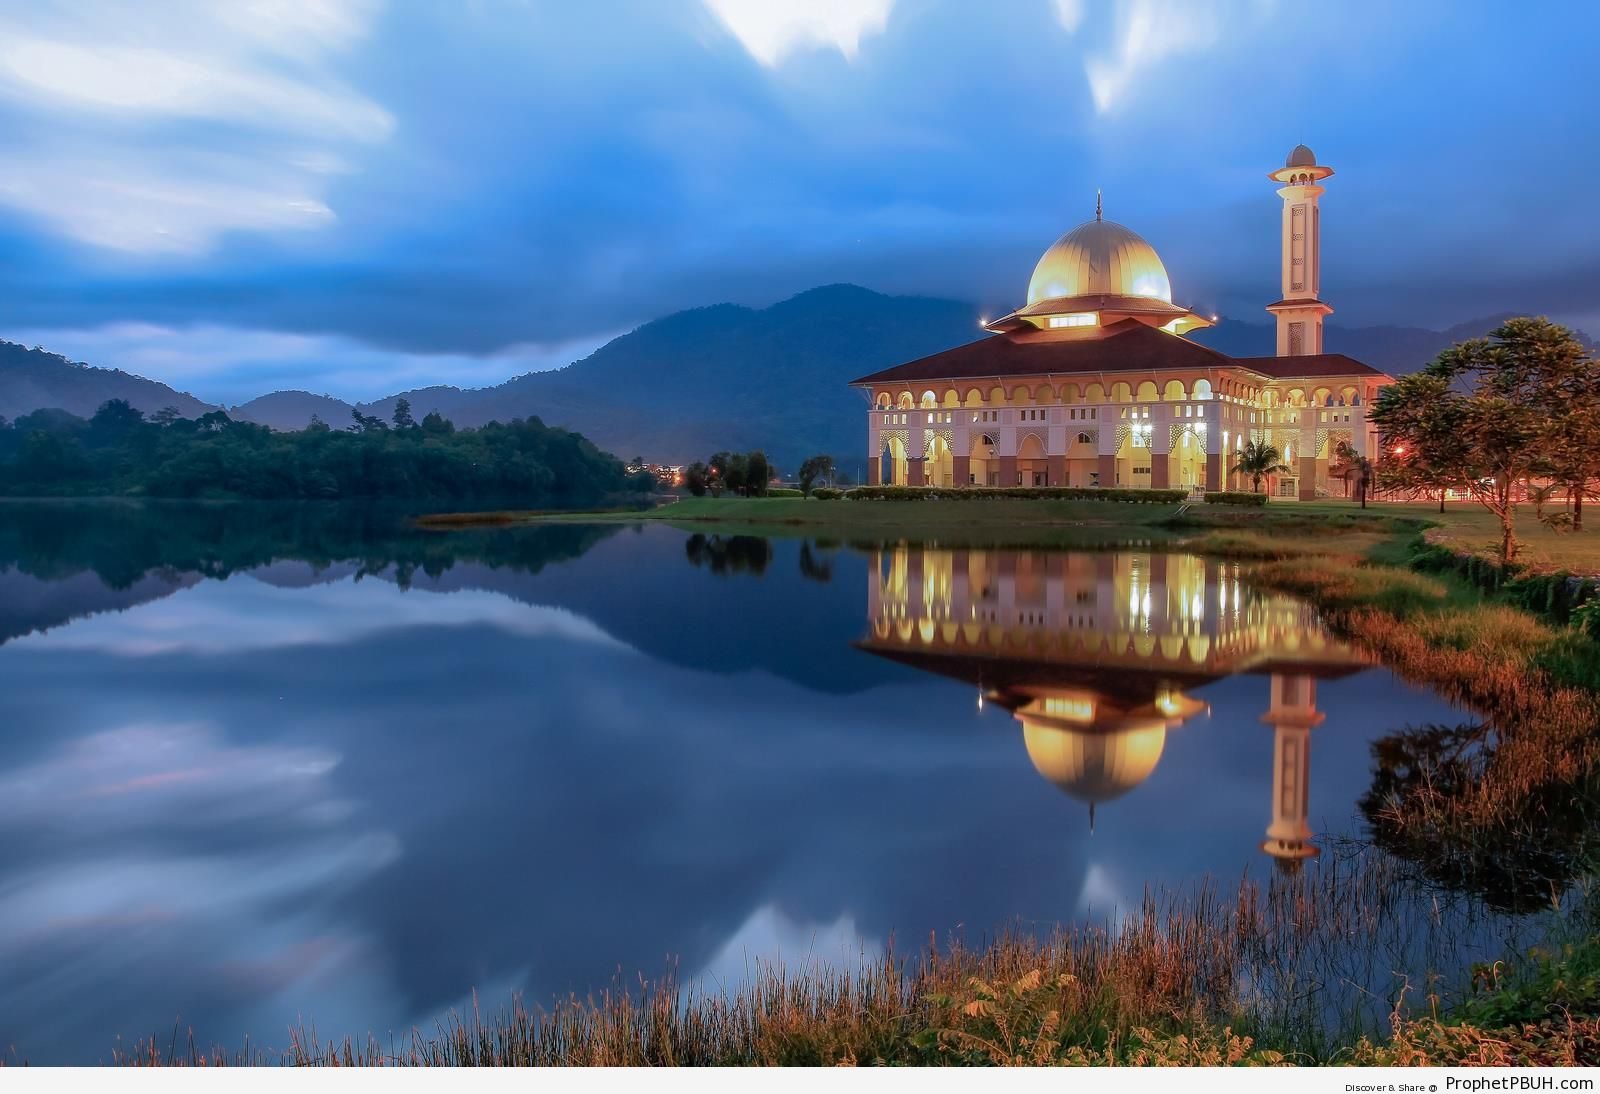 Darul Quran Mosque in Kuala Kubu Bharu, Malaysia - Darul Quran Center in Kuala Kubu Bharu, Malaysia -Picture